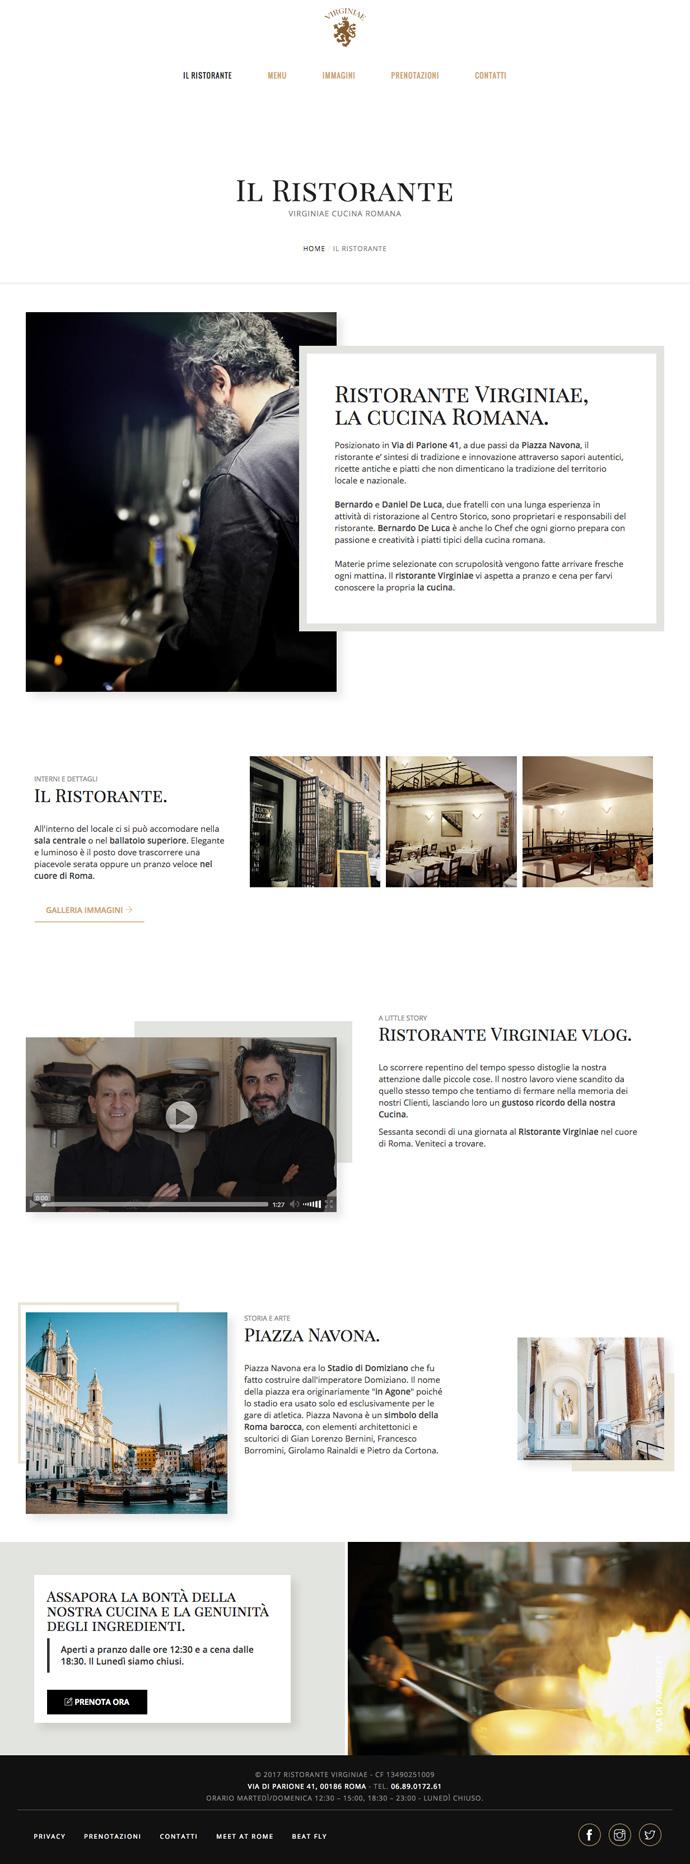 ristorante-virginiae-roma-cucina-romana